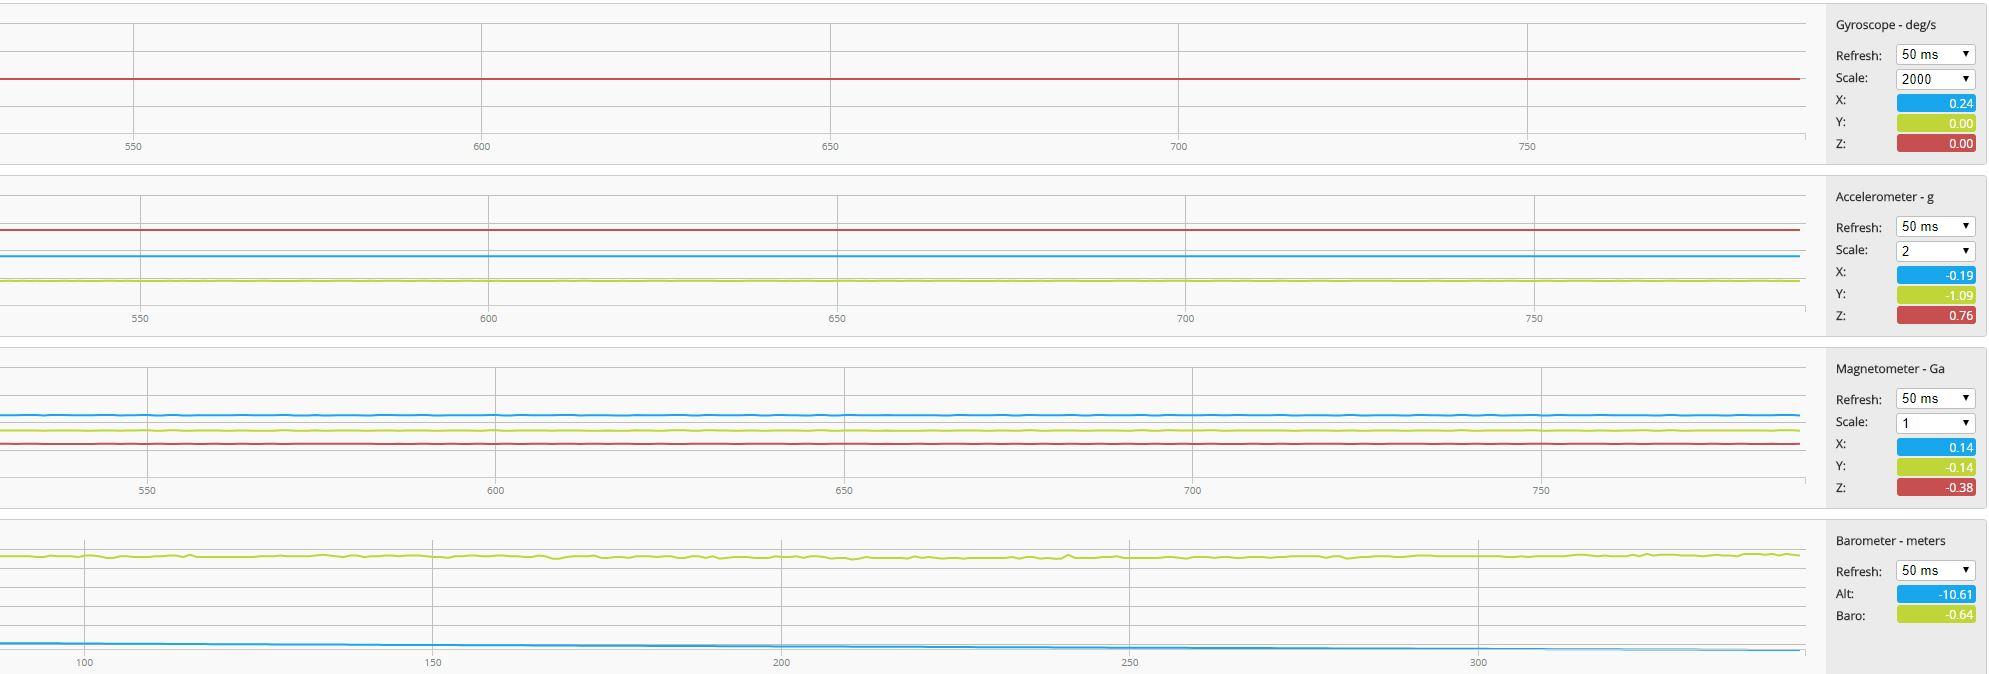 Accelerometer Calibrationproblem on F3 10DOF · Issue #3155